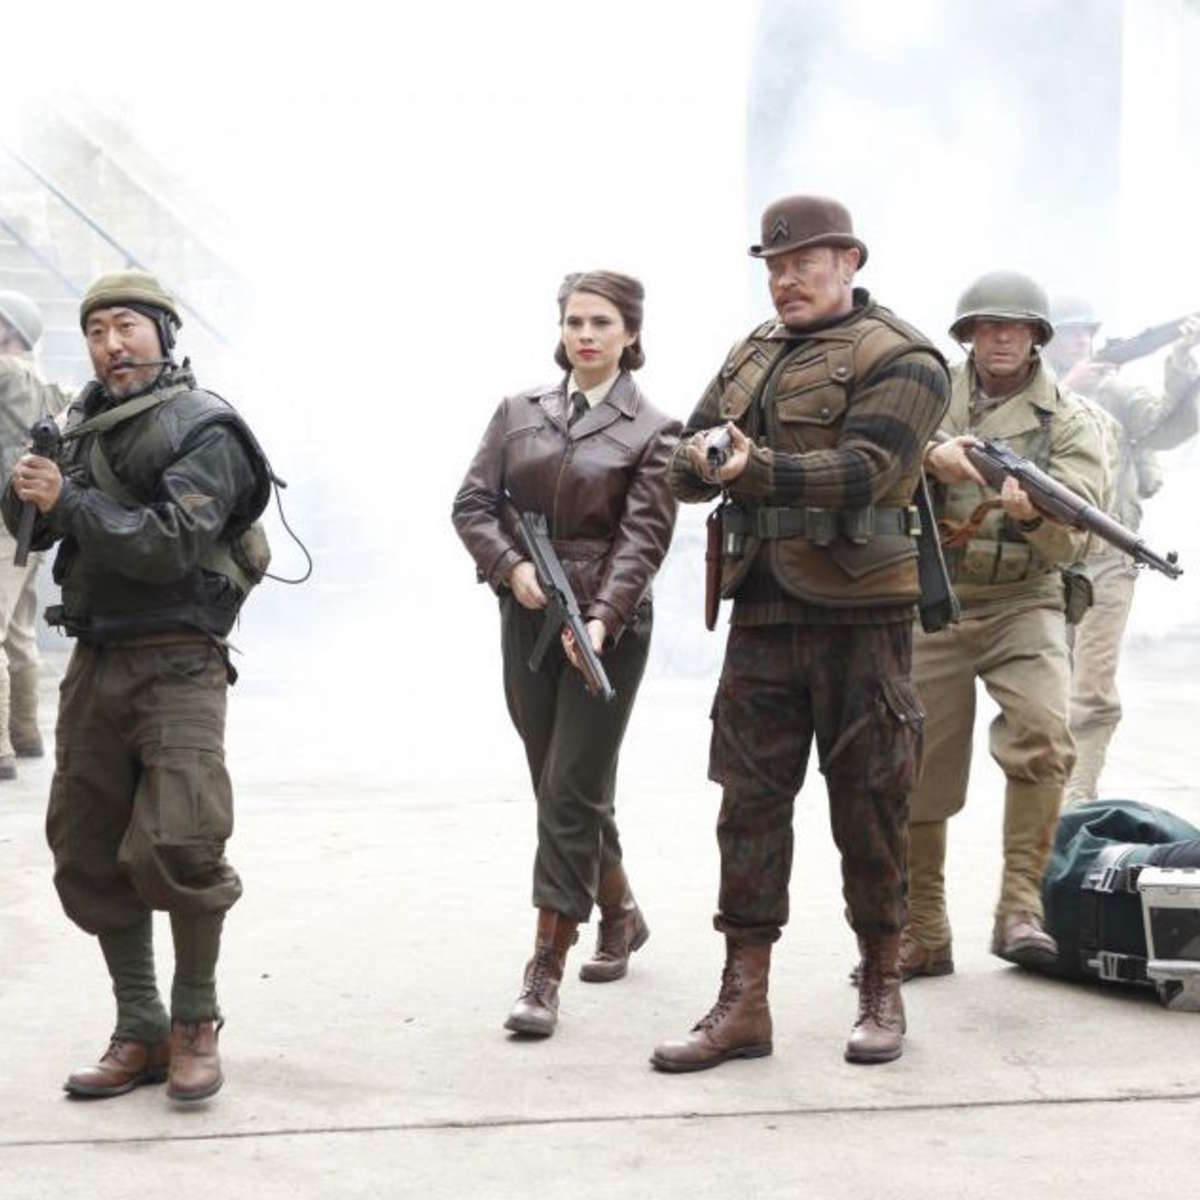 agents-carter-and-commandos.jpg